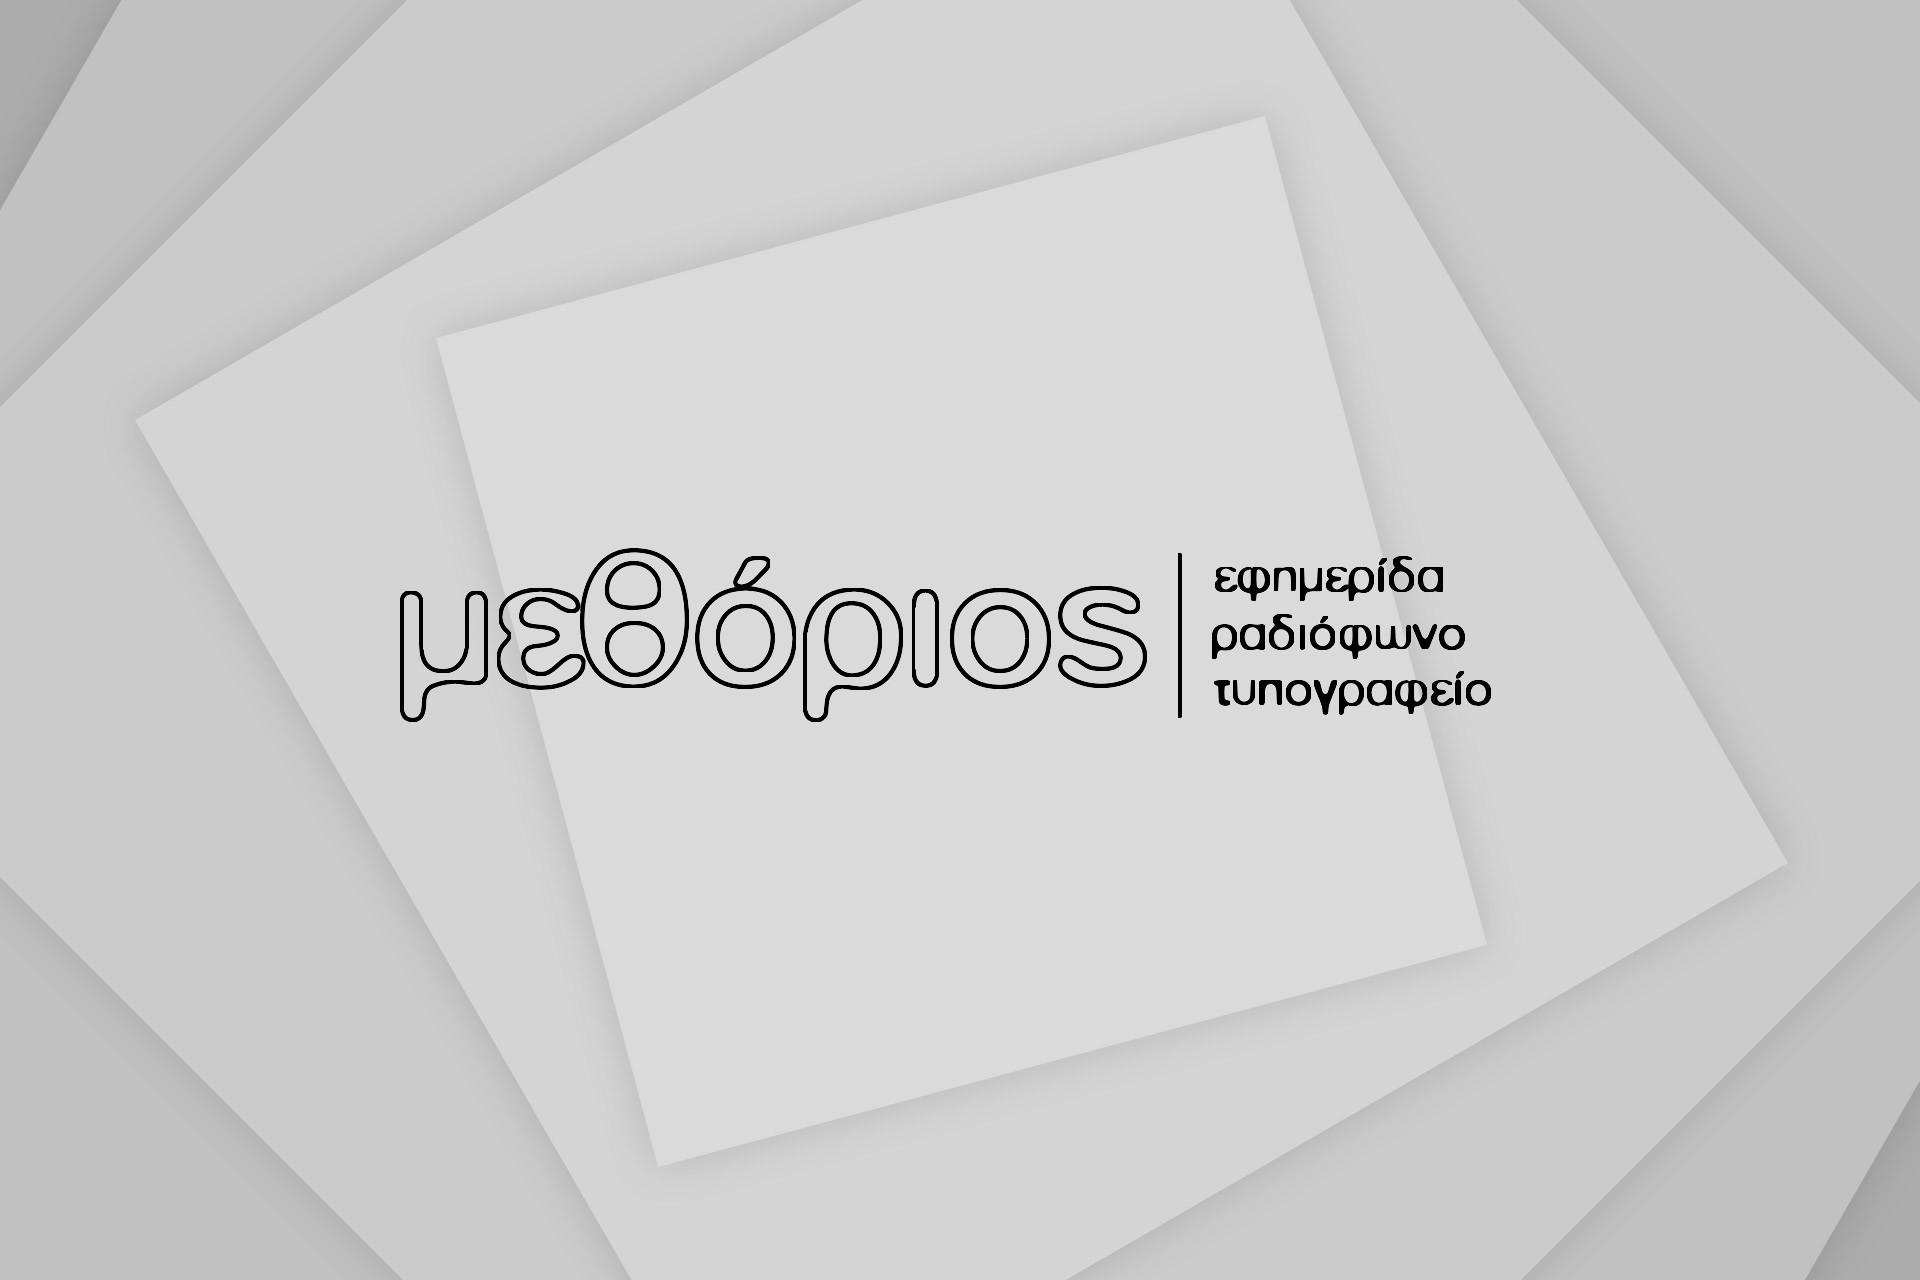 methorios.gr